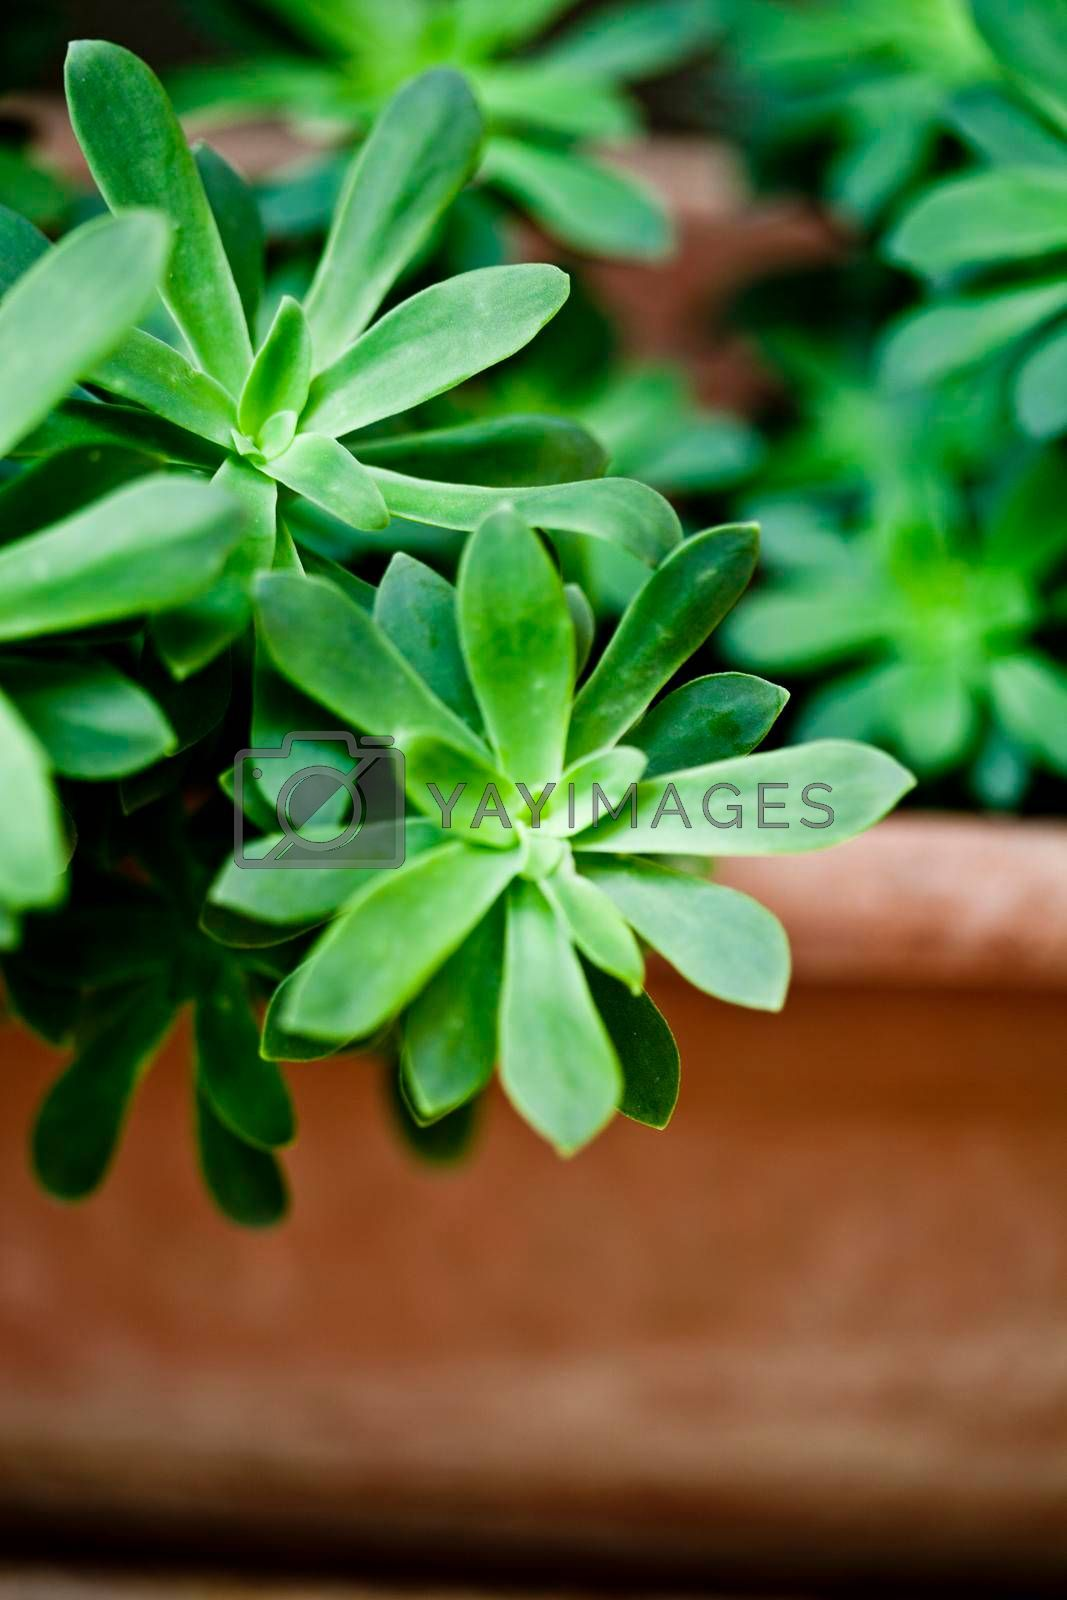 Green succulent plant closeup on ceramic pot with copy space.